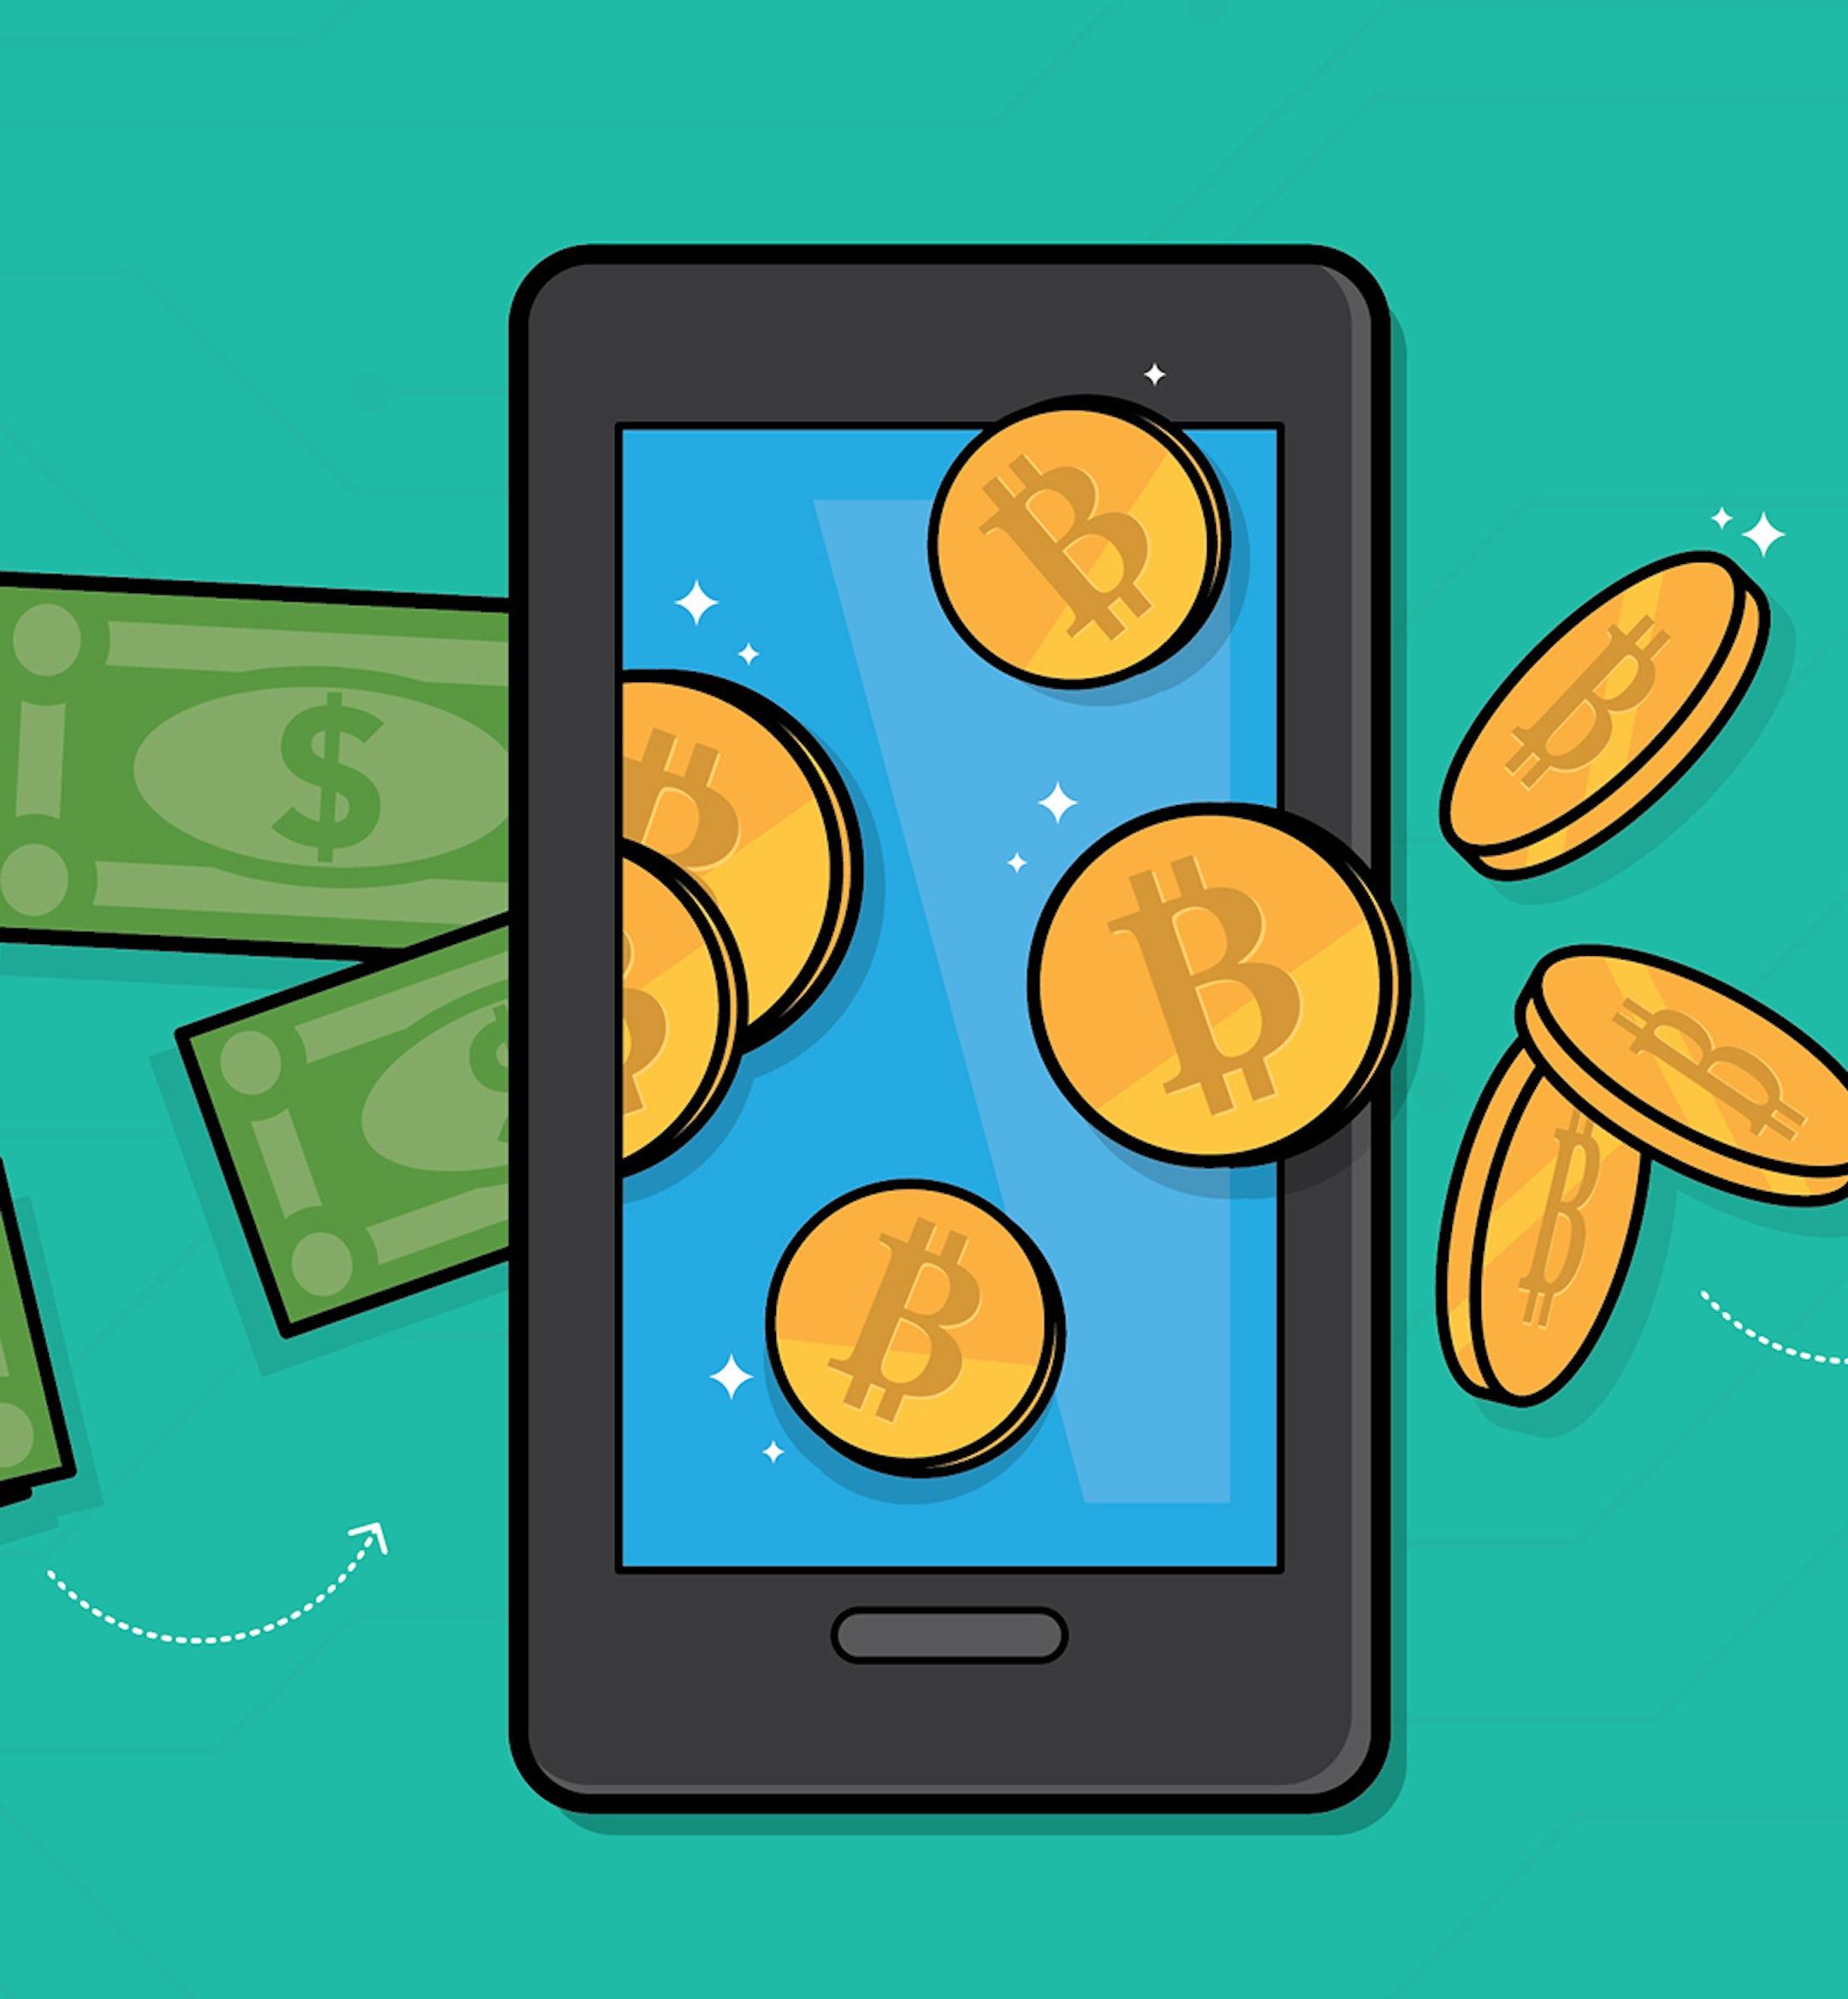 Crypto Browser mobile